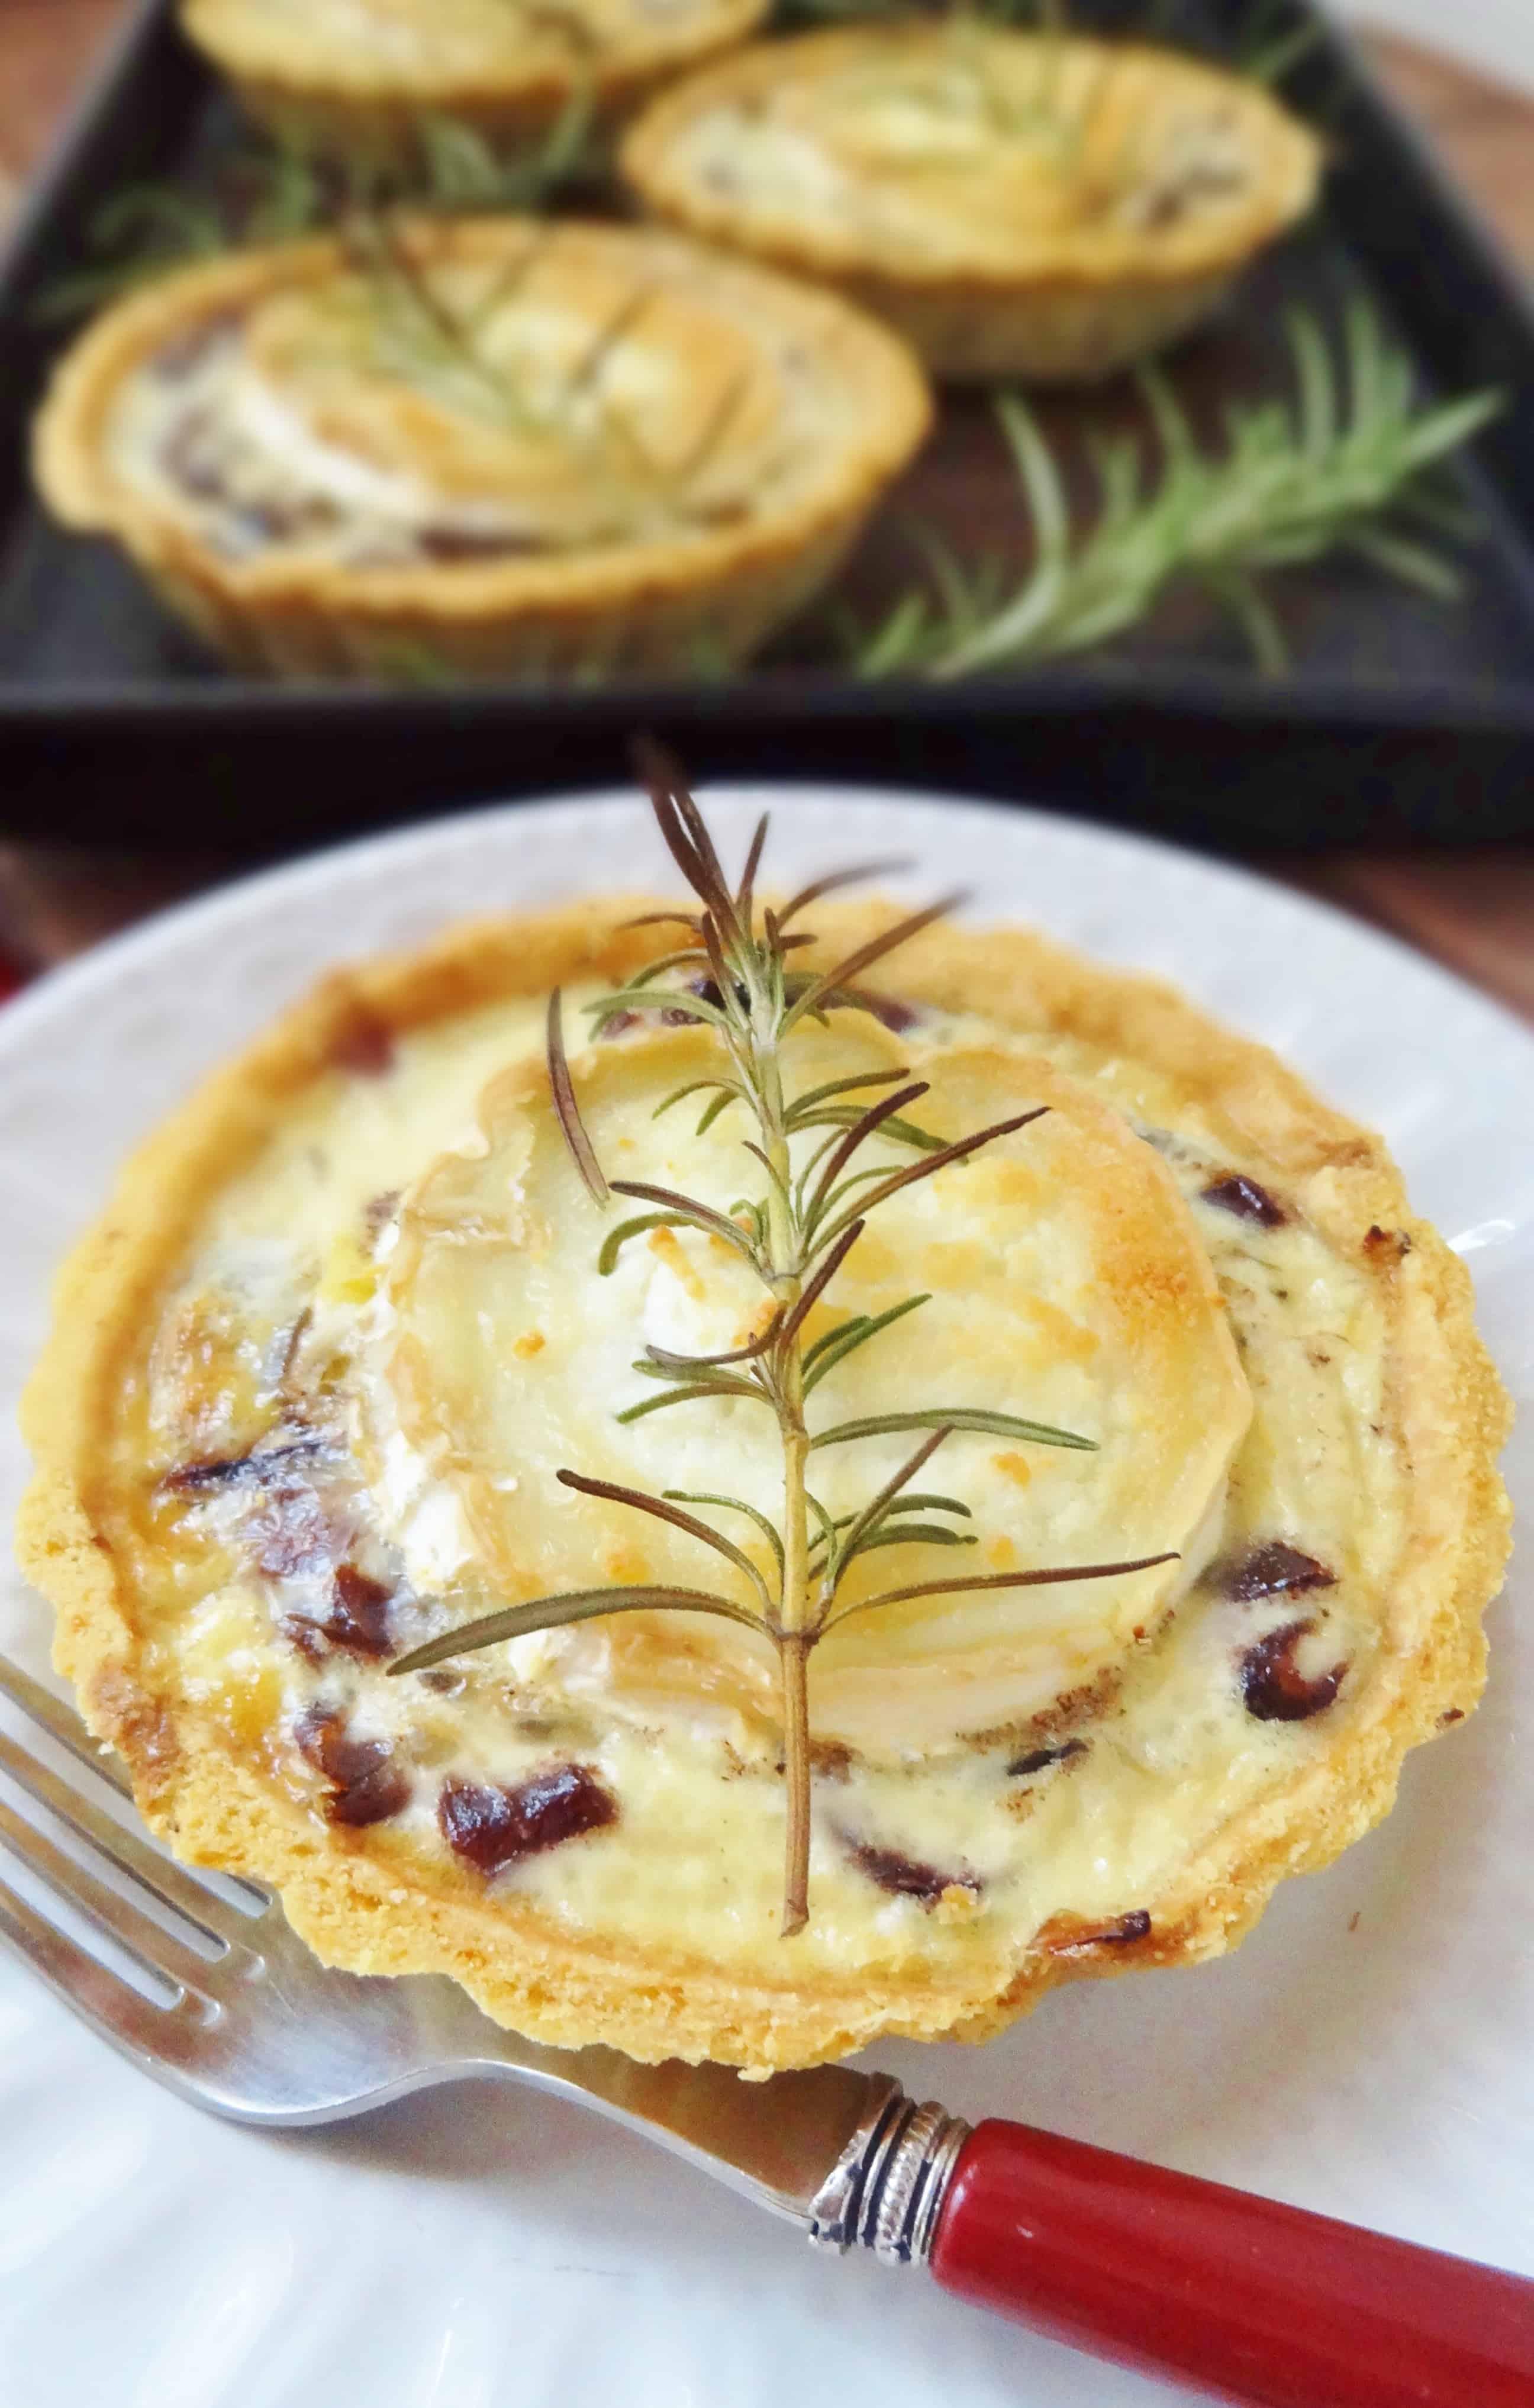 Parmesan Cheese And Walnut Tart Recipes — Dishmaps